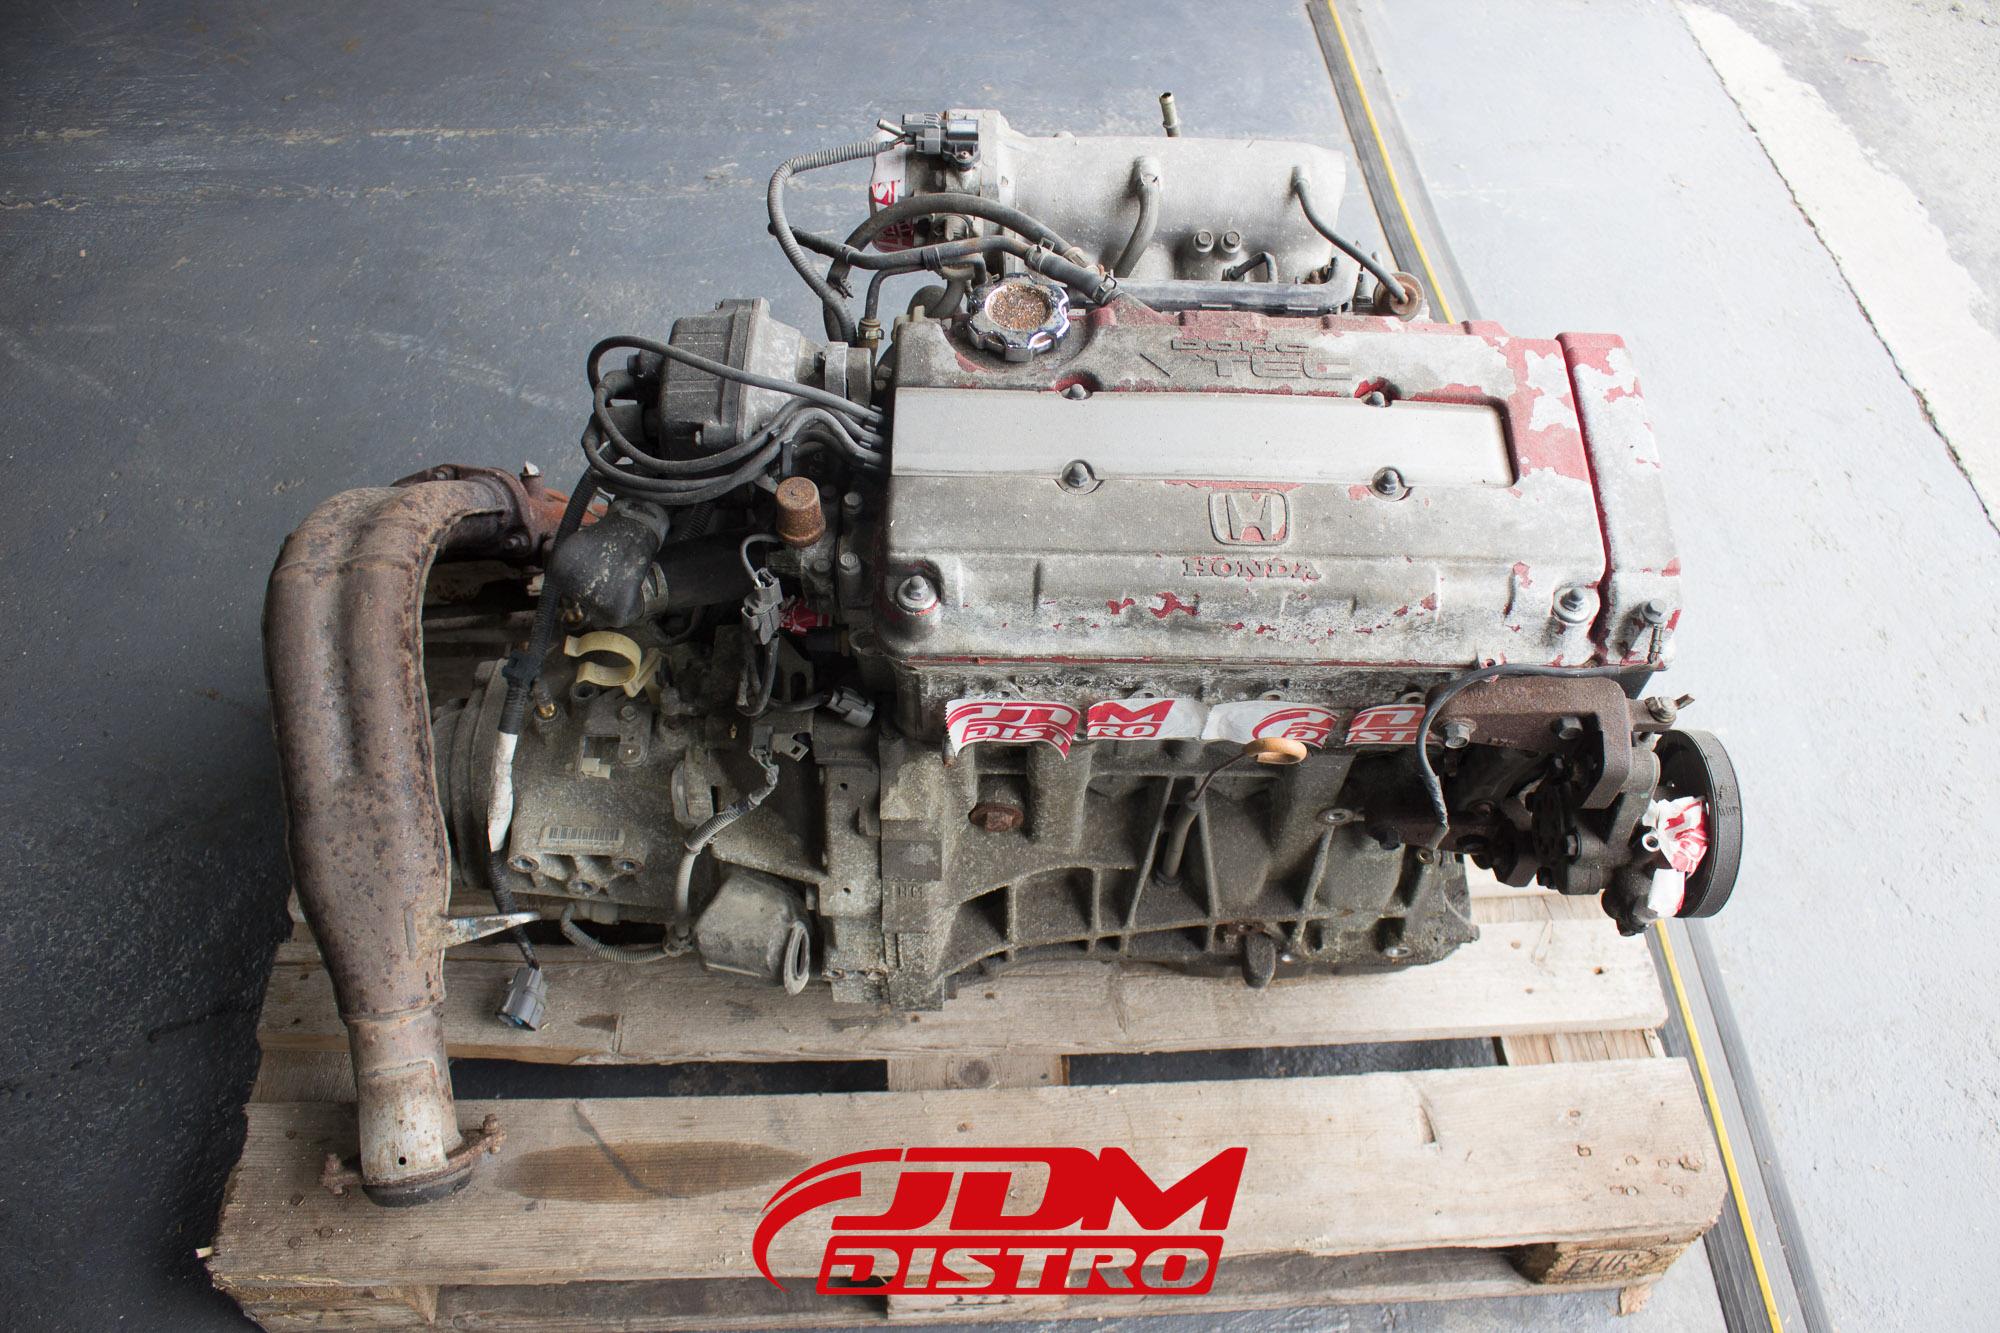 hight resolution of honda civic type r ek9 b16b engine and s4c gearbox jdmdistro buy jdm parts online worldwide shipping